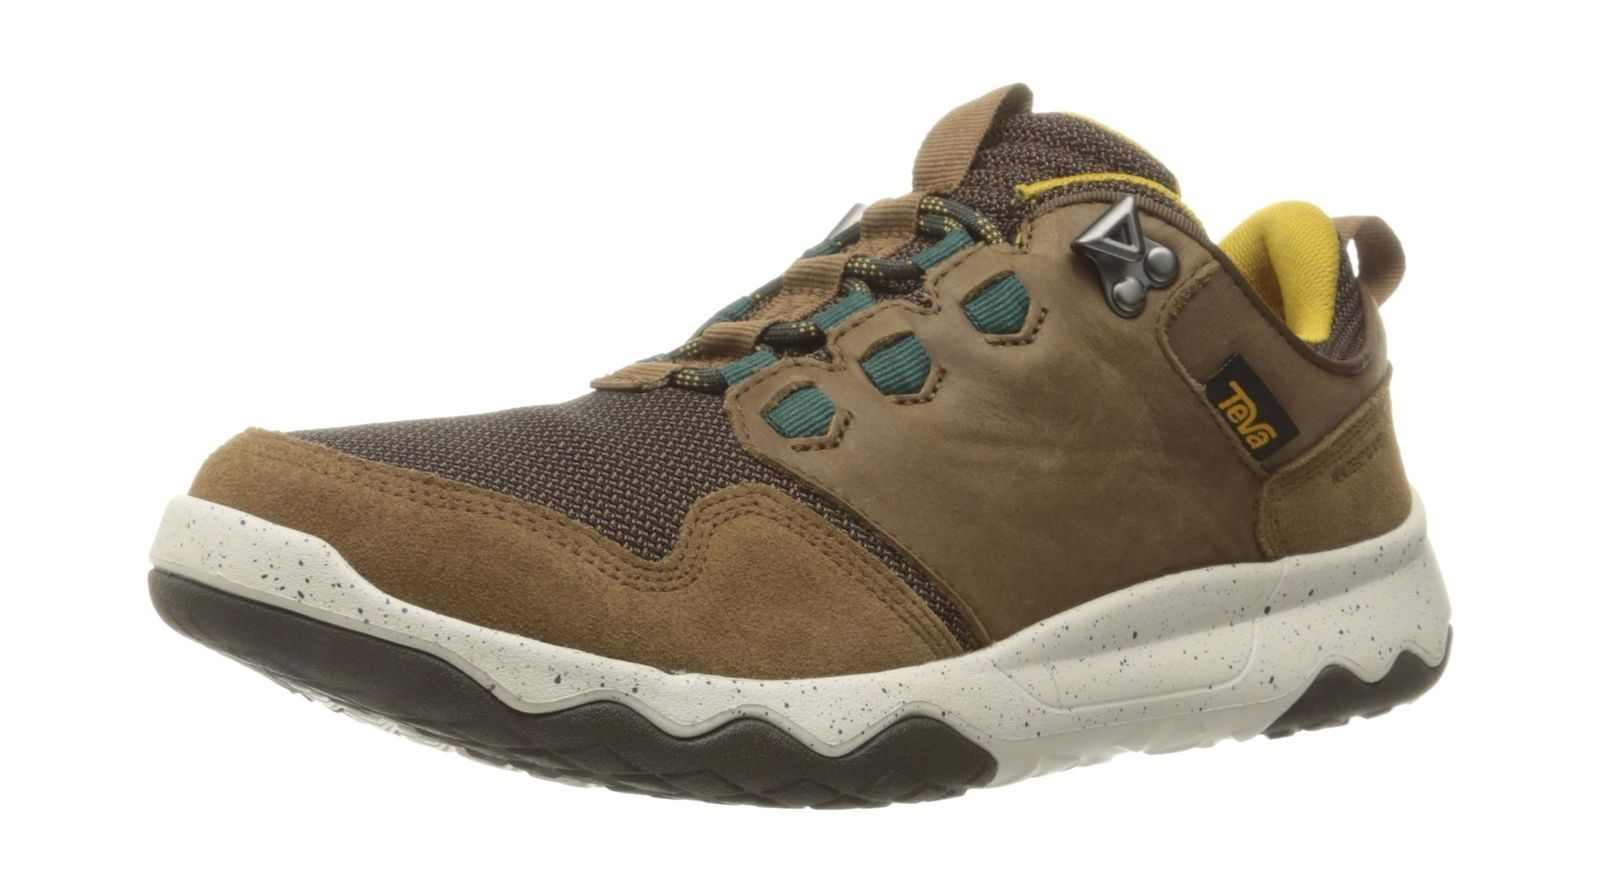 Mens M Arrowood Wp-m Low Rise Hiking Boots Teva Nq59Eh1